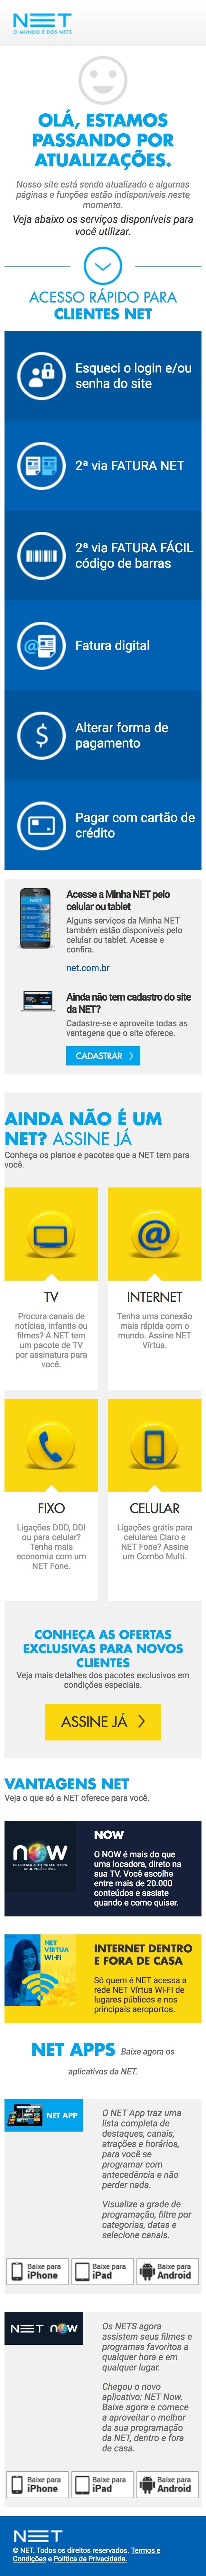 NET - CMS Indisponível - 011.jpg